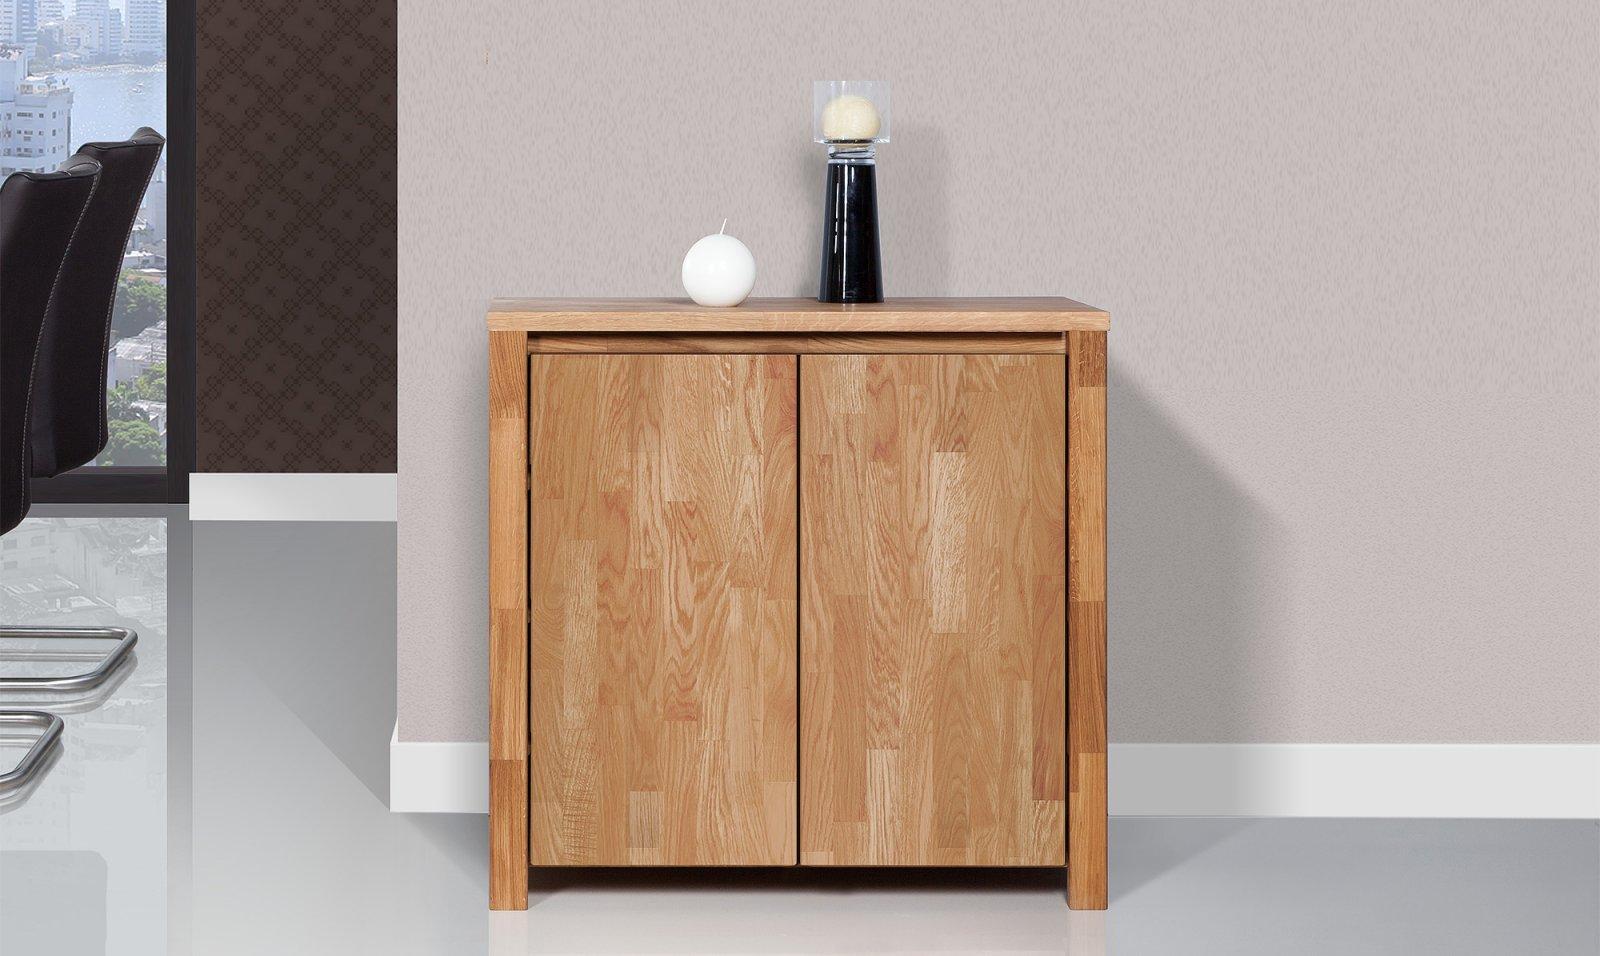 Komoda VINCI z litego drewna